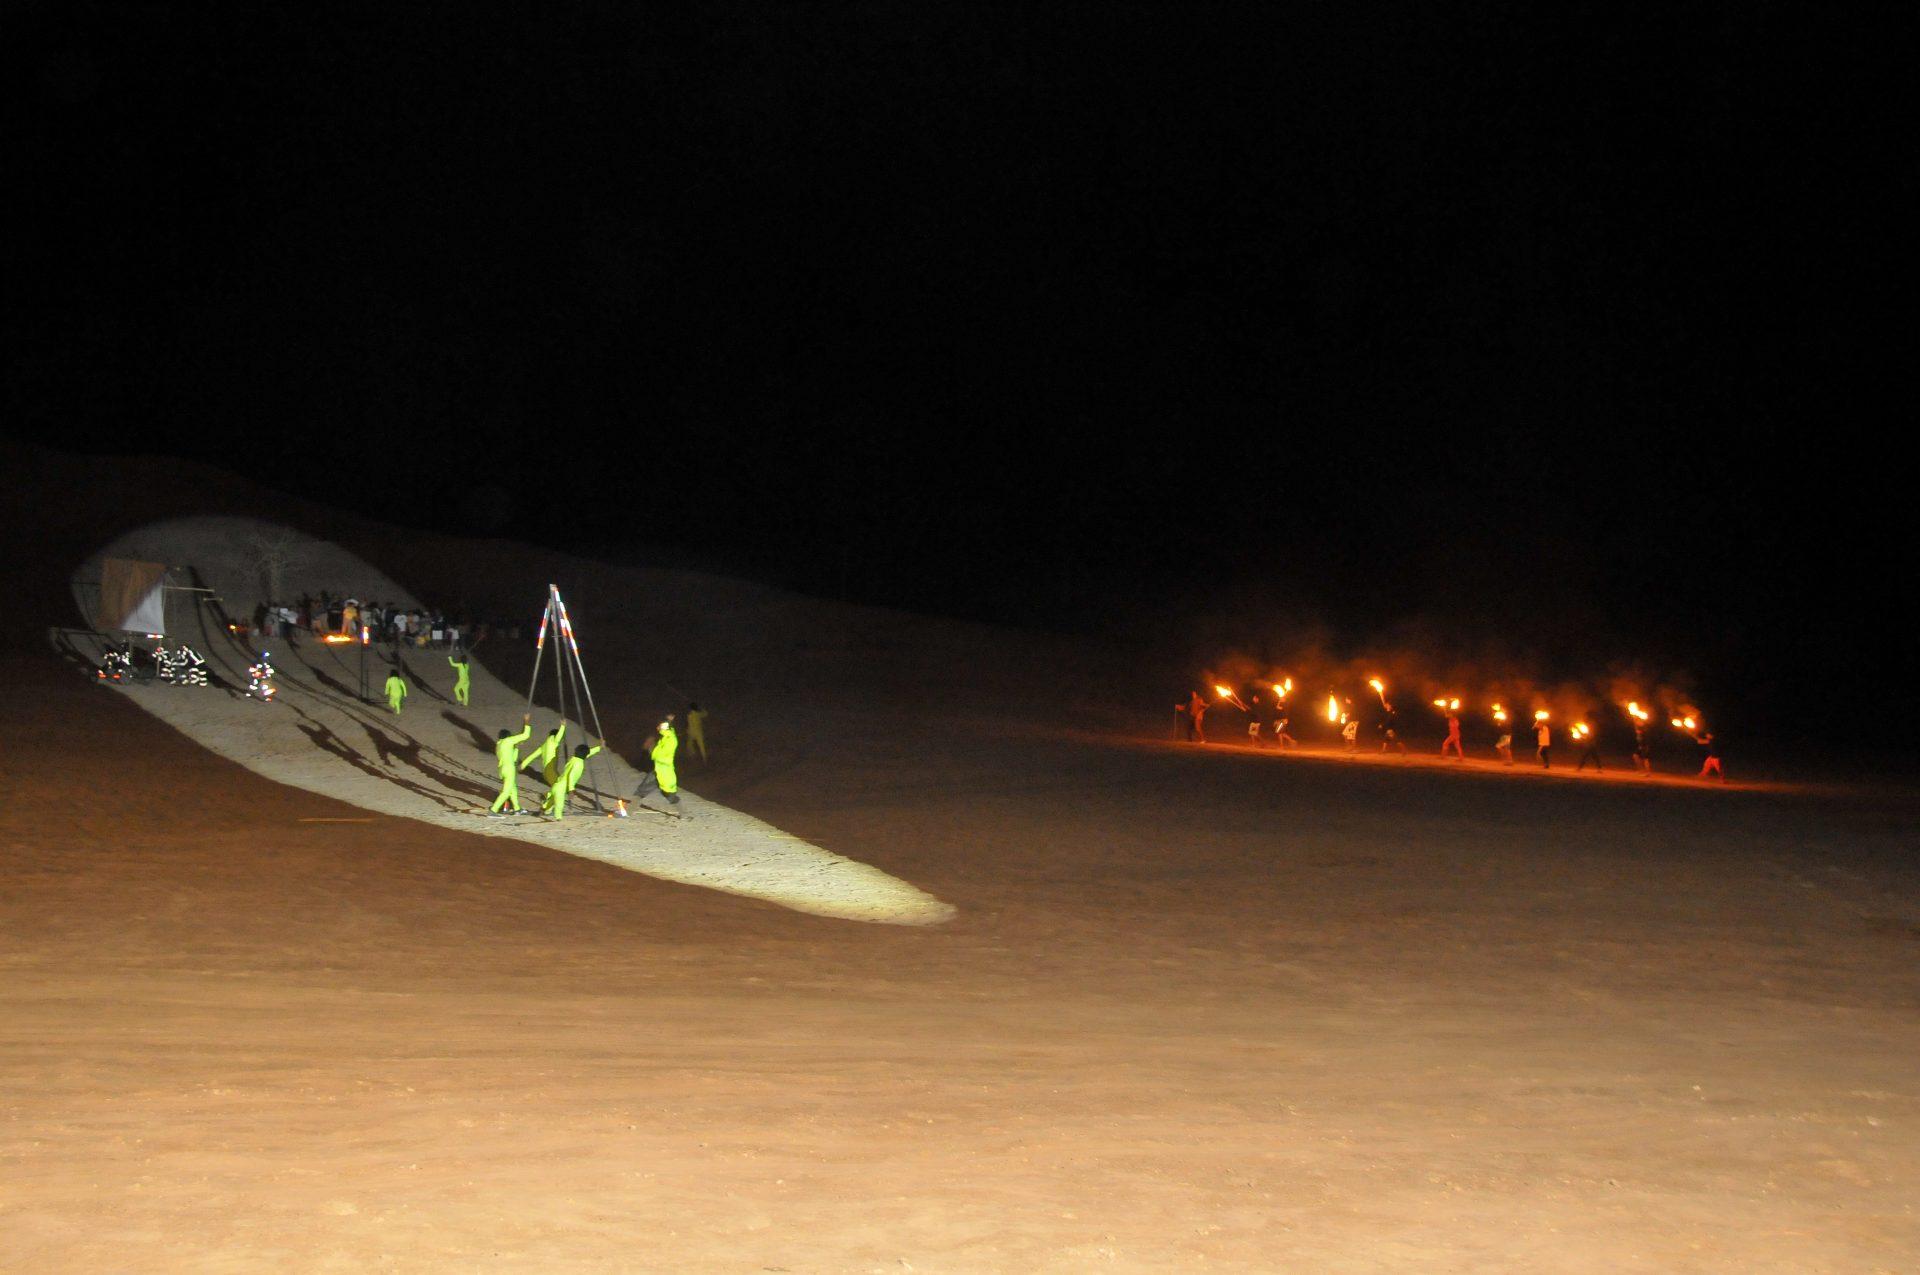 2008_peru_desierto_present3_13_desert_final